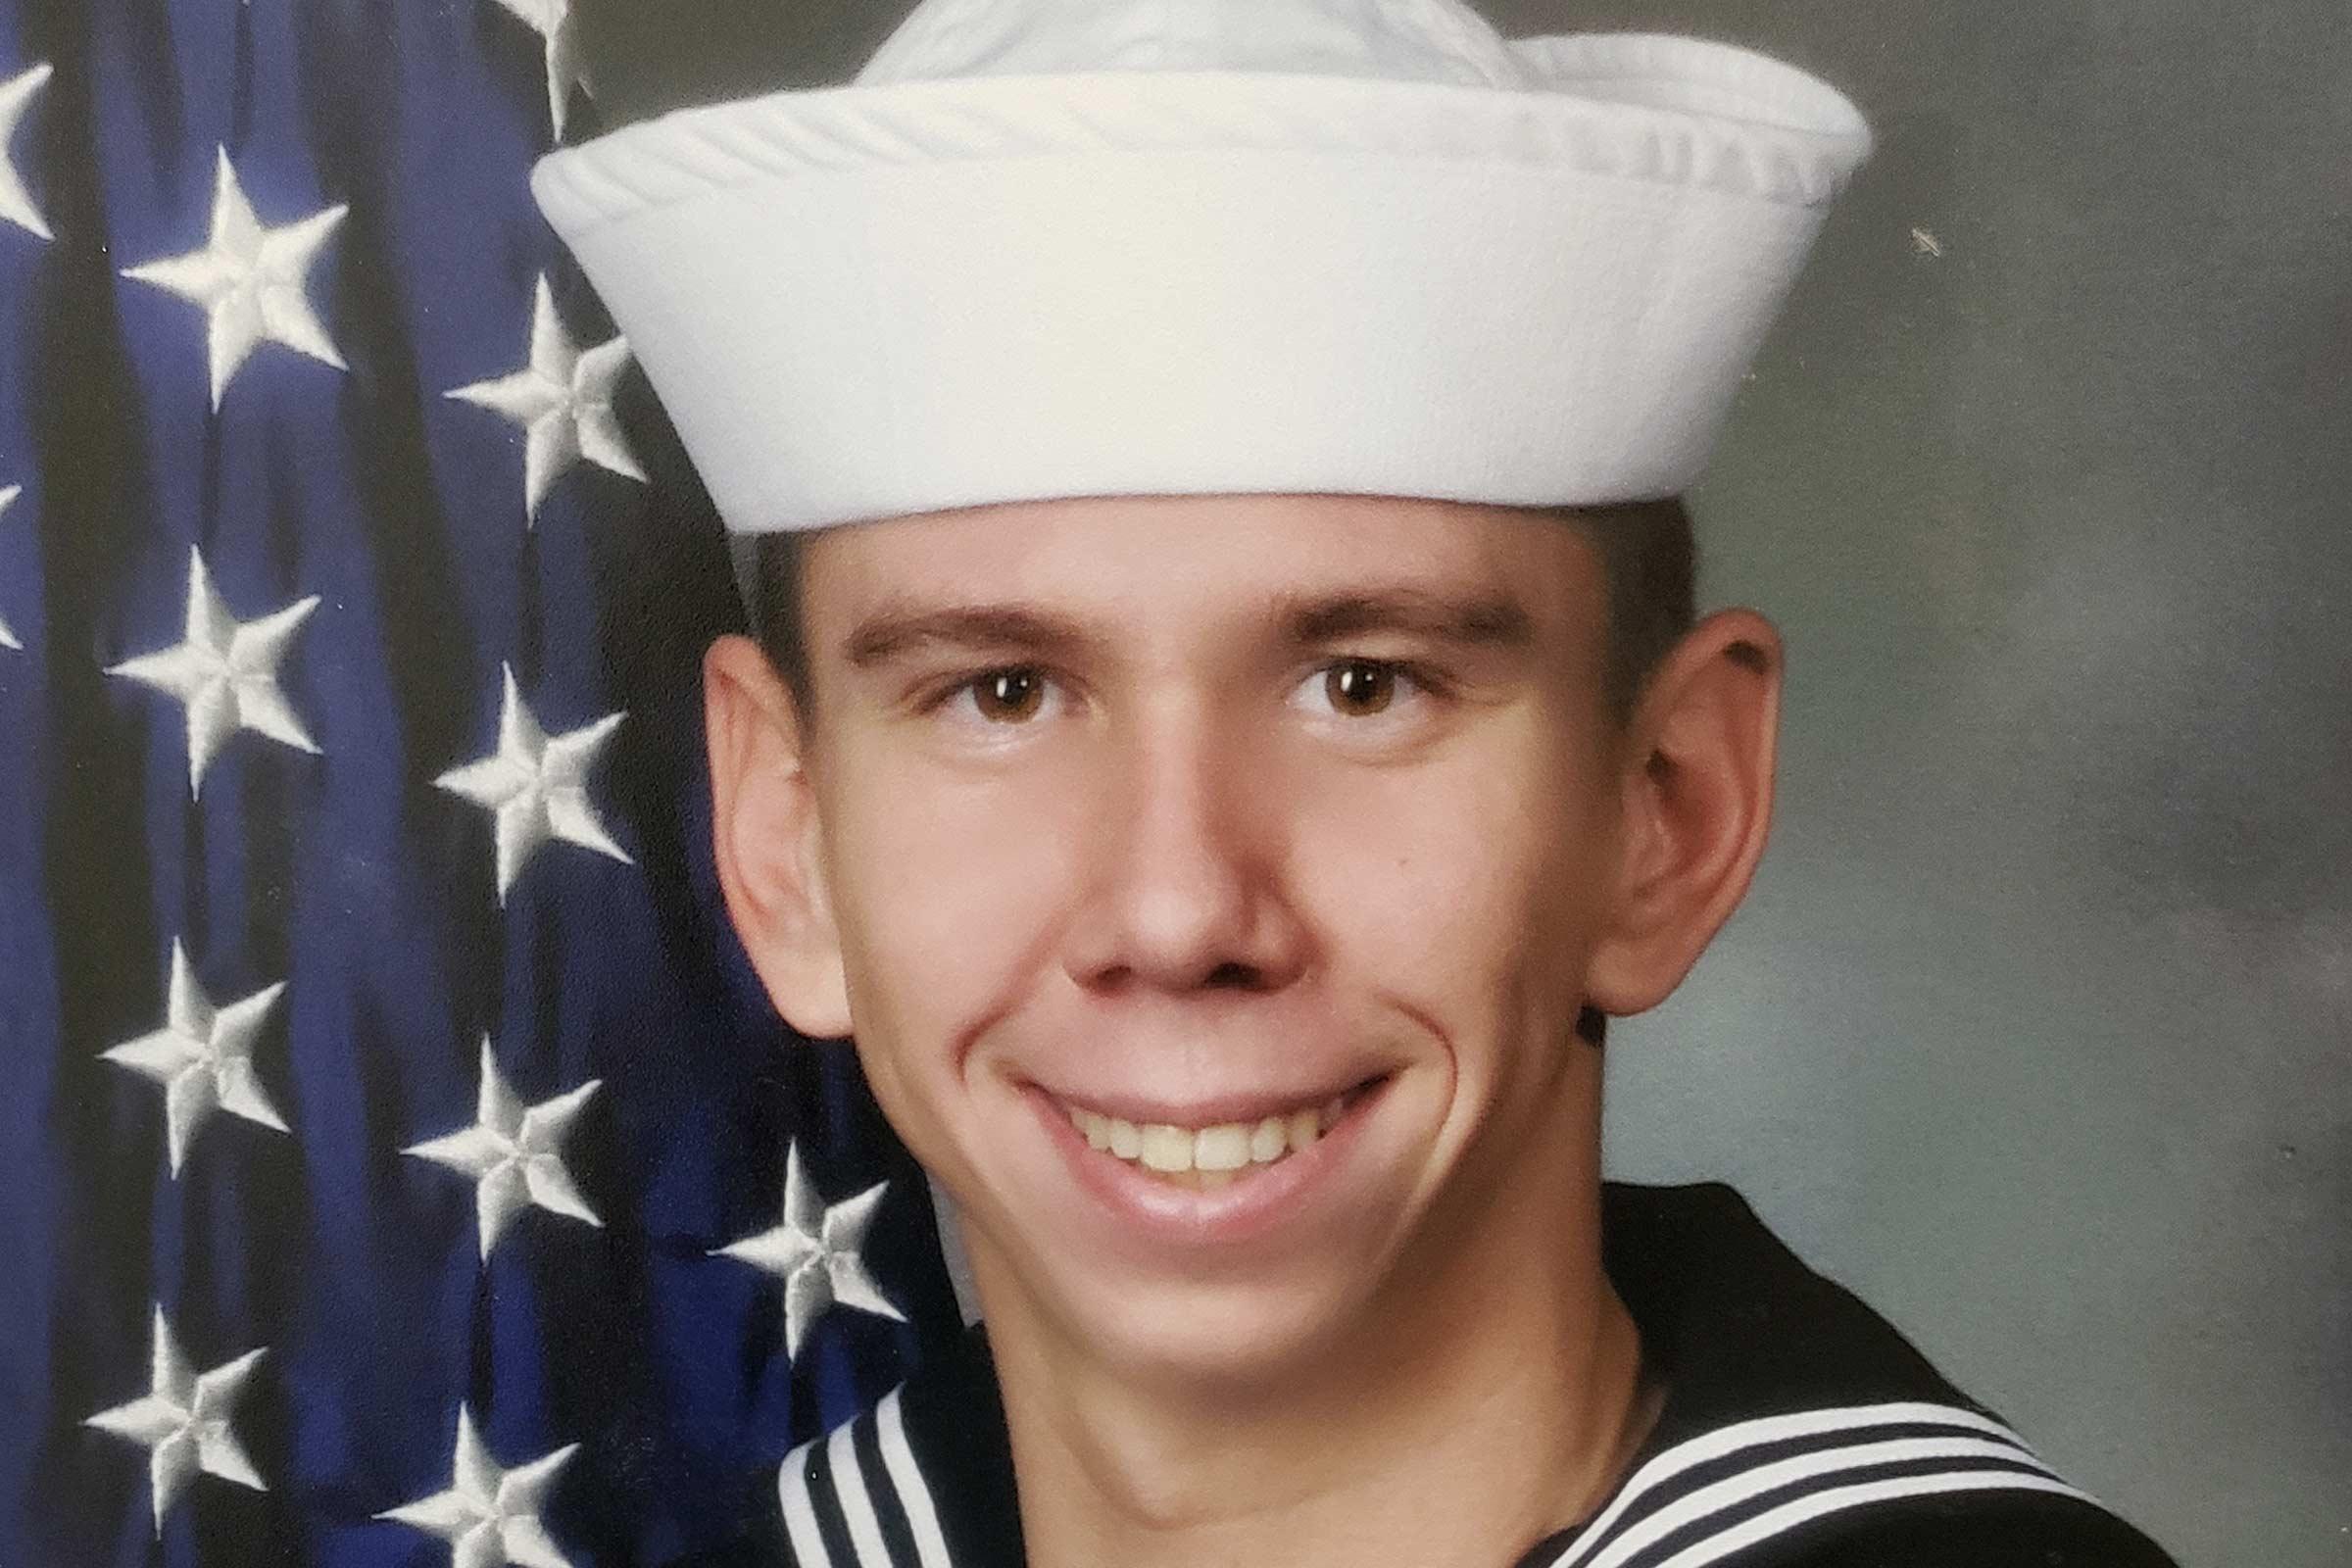 Sailor's Suicide Prompts Calls for Better Mental Health Treatment